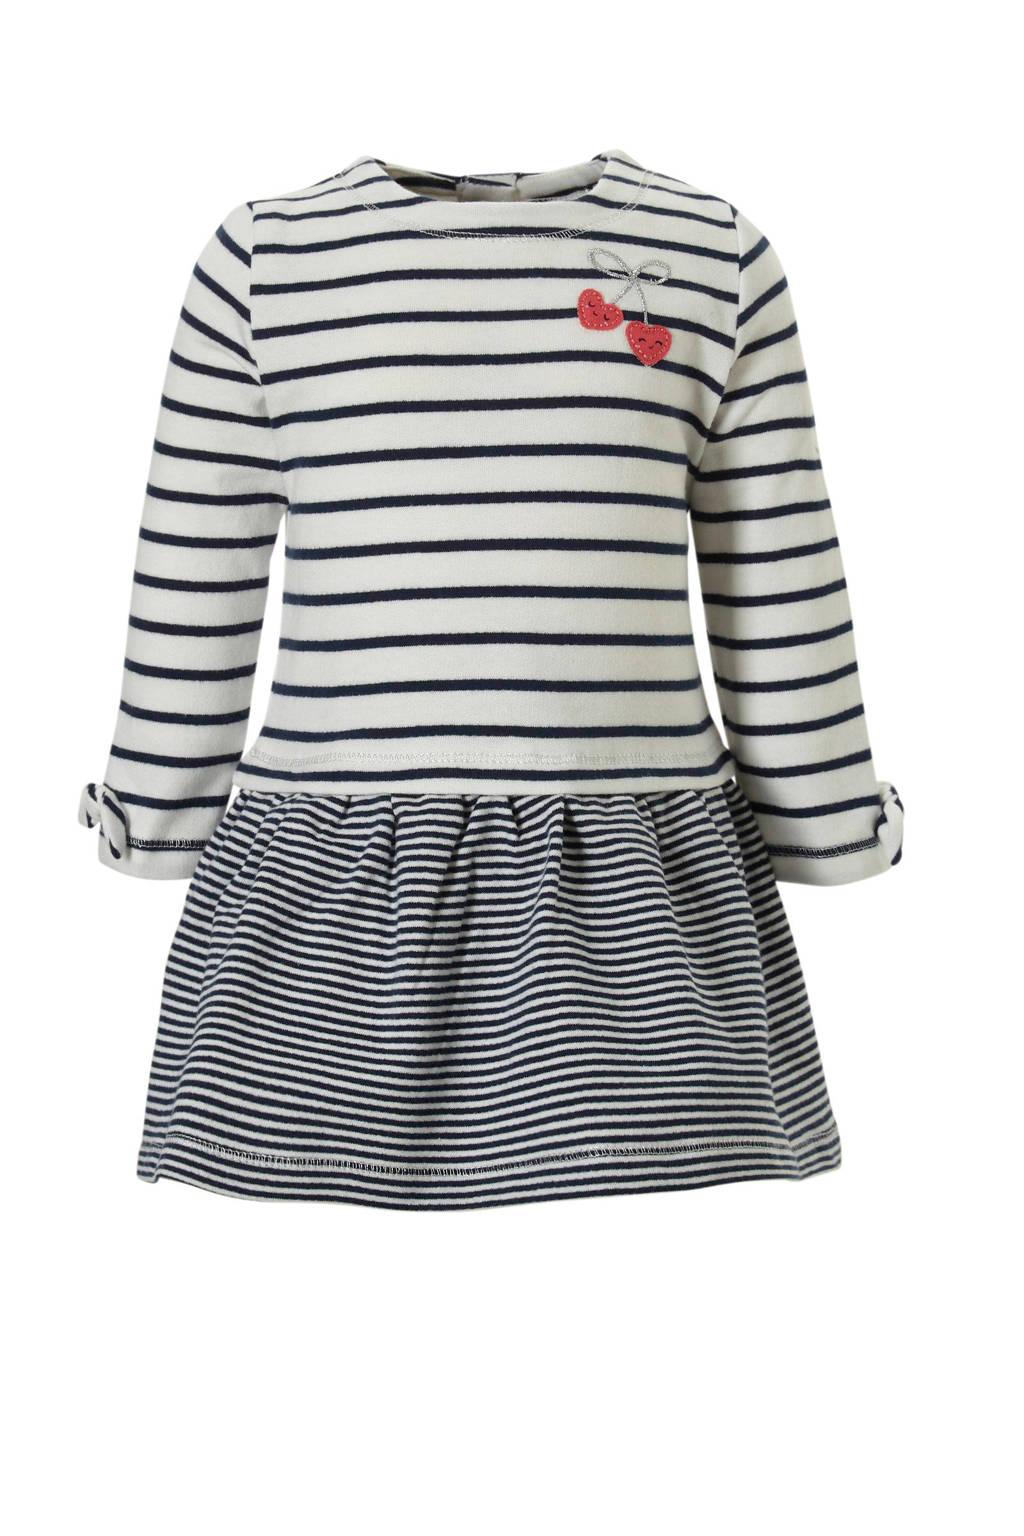 C&A Baby Club gestreepte jurk ecru/blauw, Ecru/donkerblauw